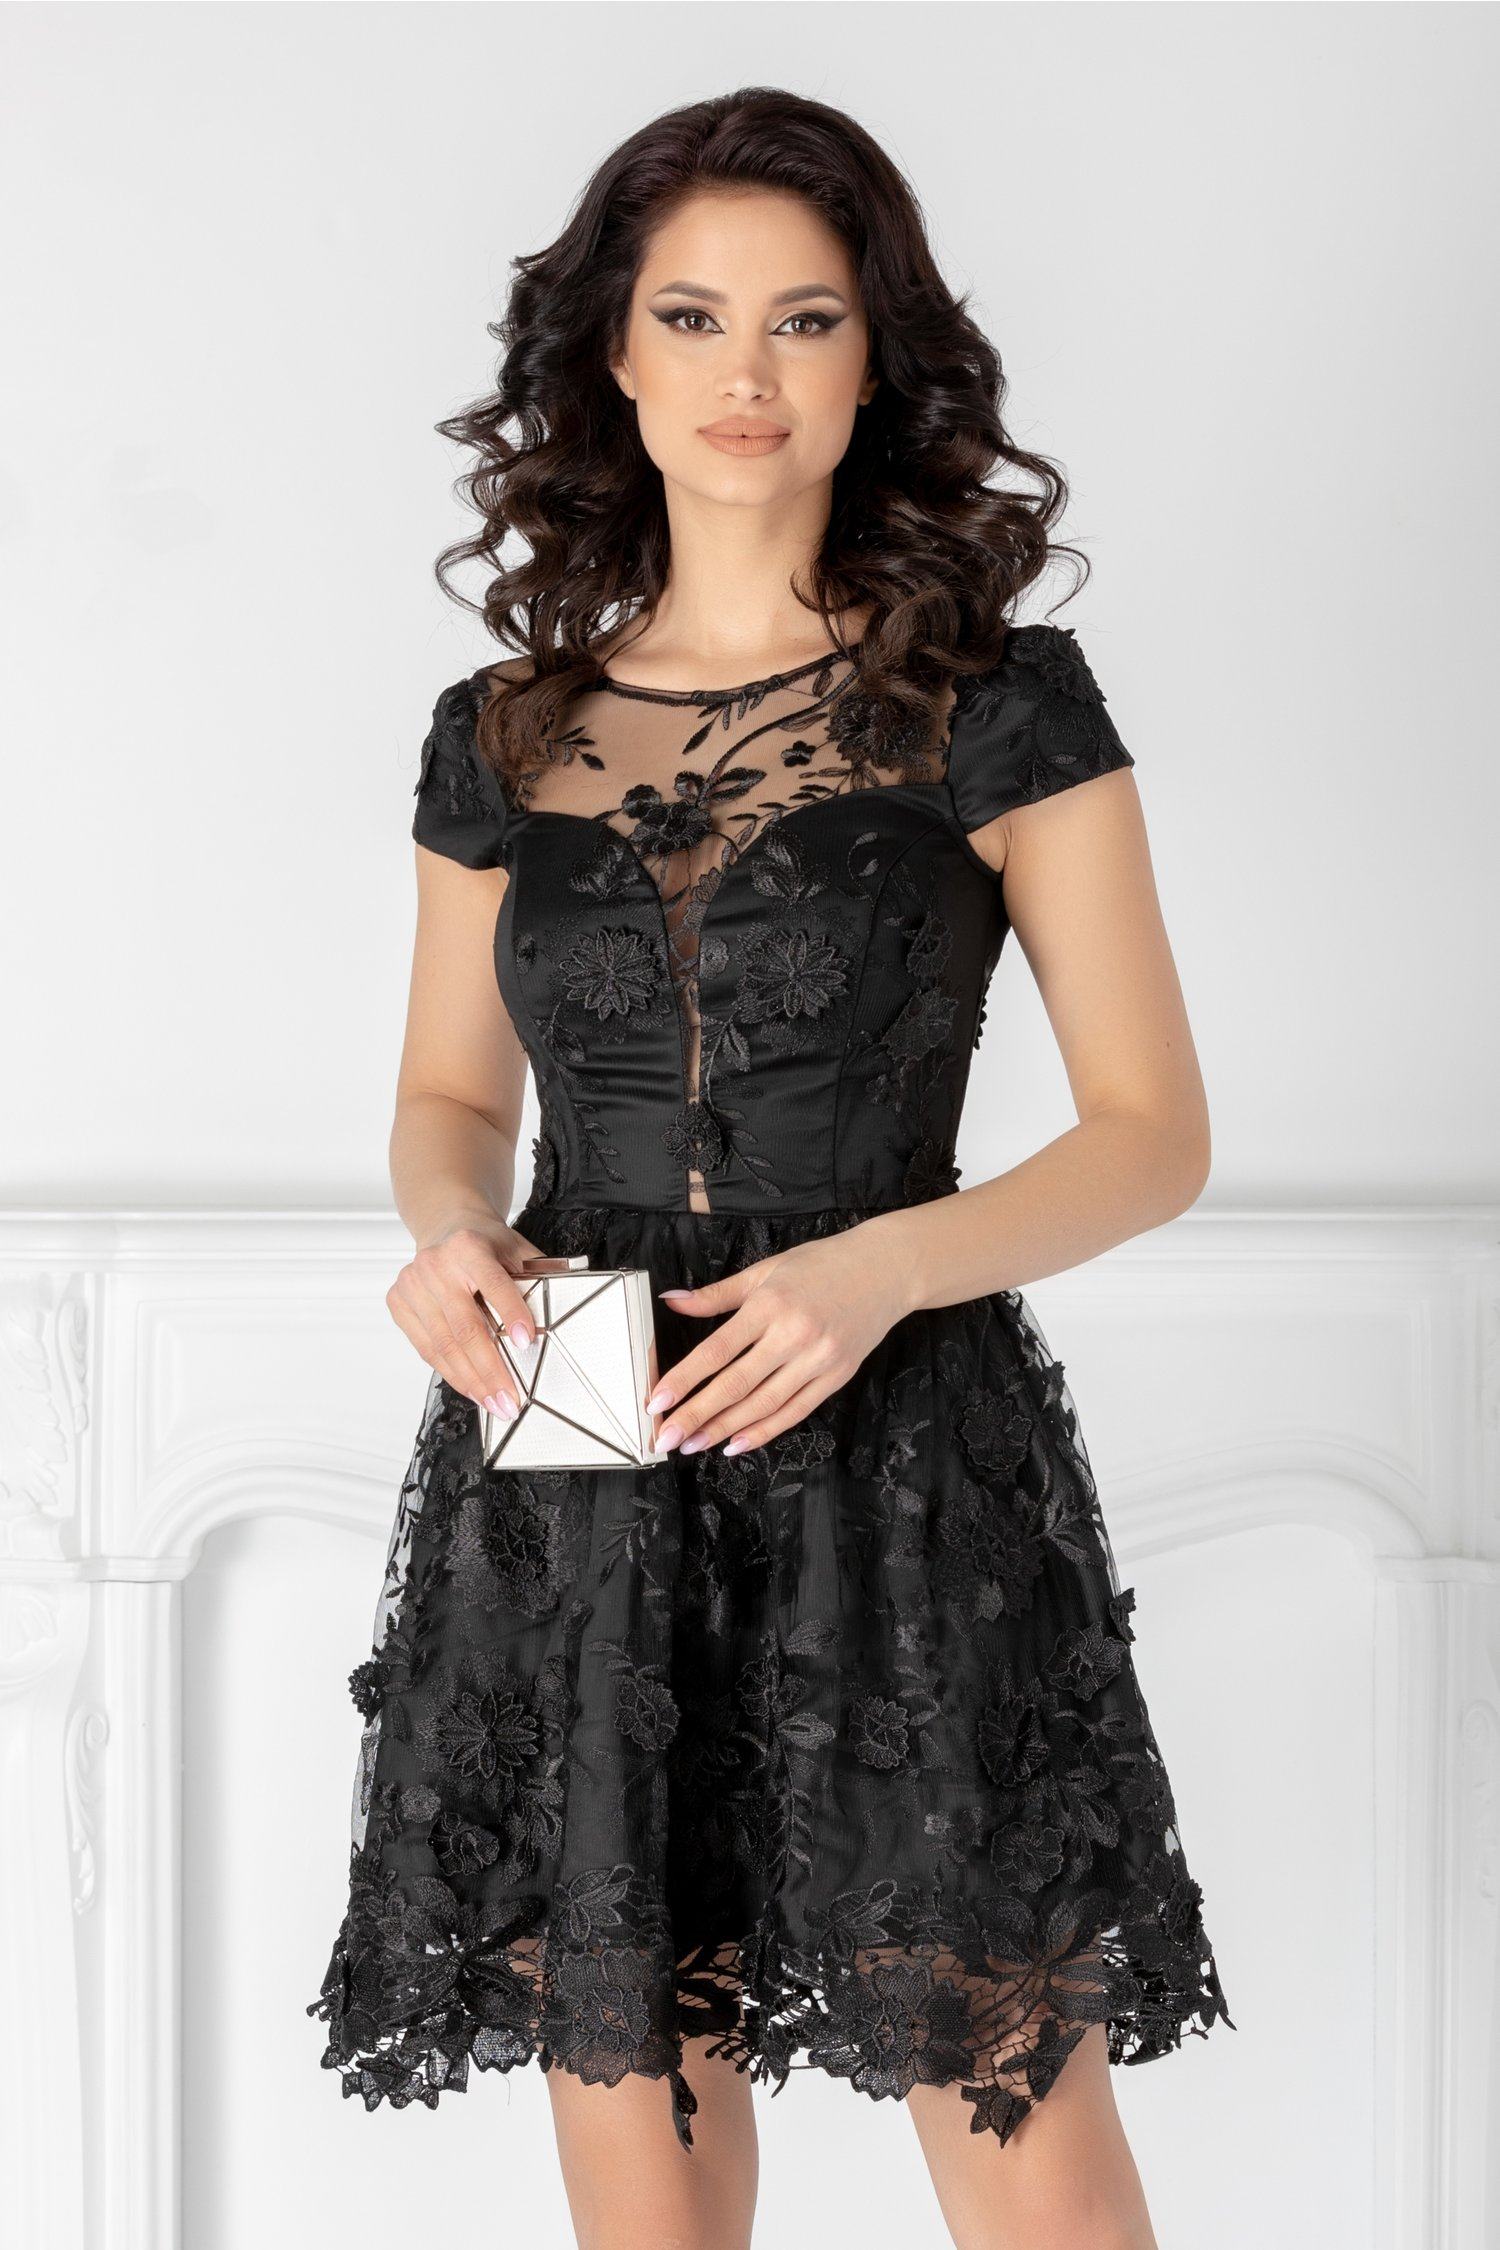 Rochie Liza neagra cu dantela florala 3D